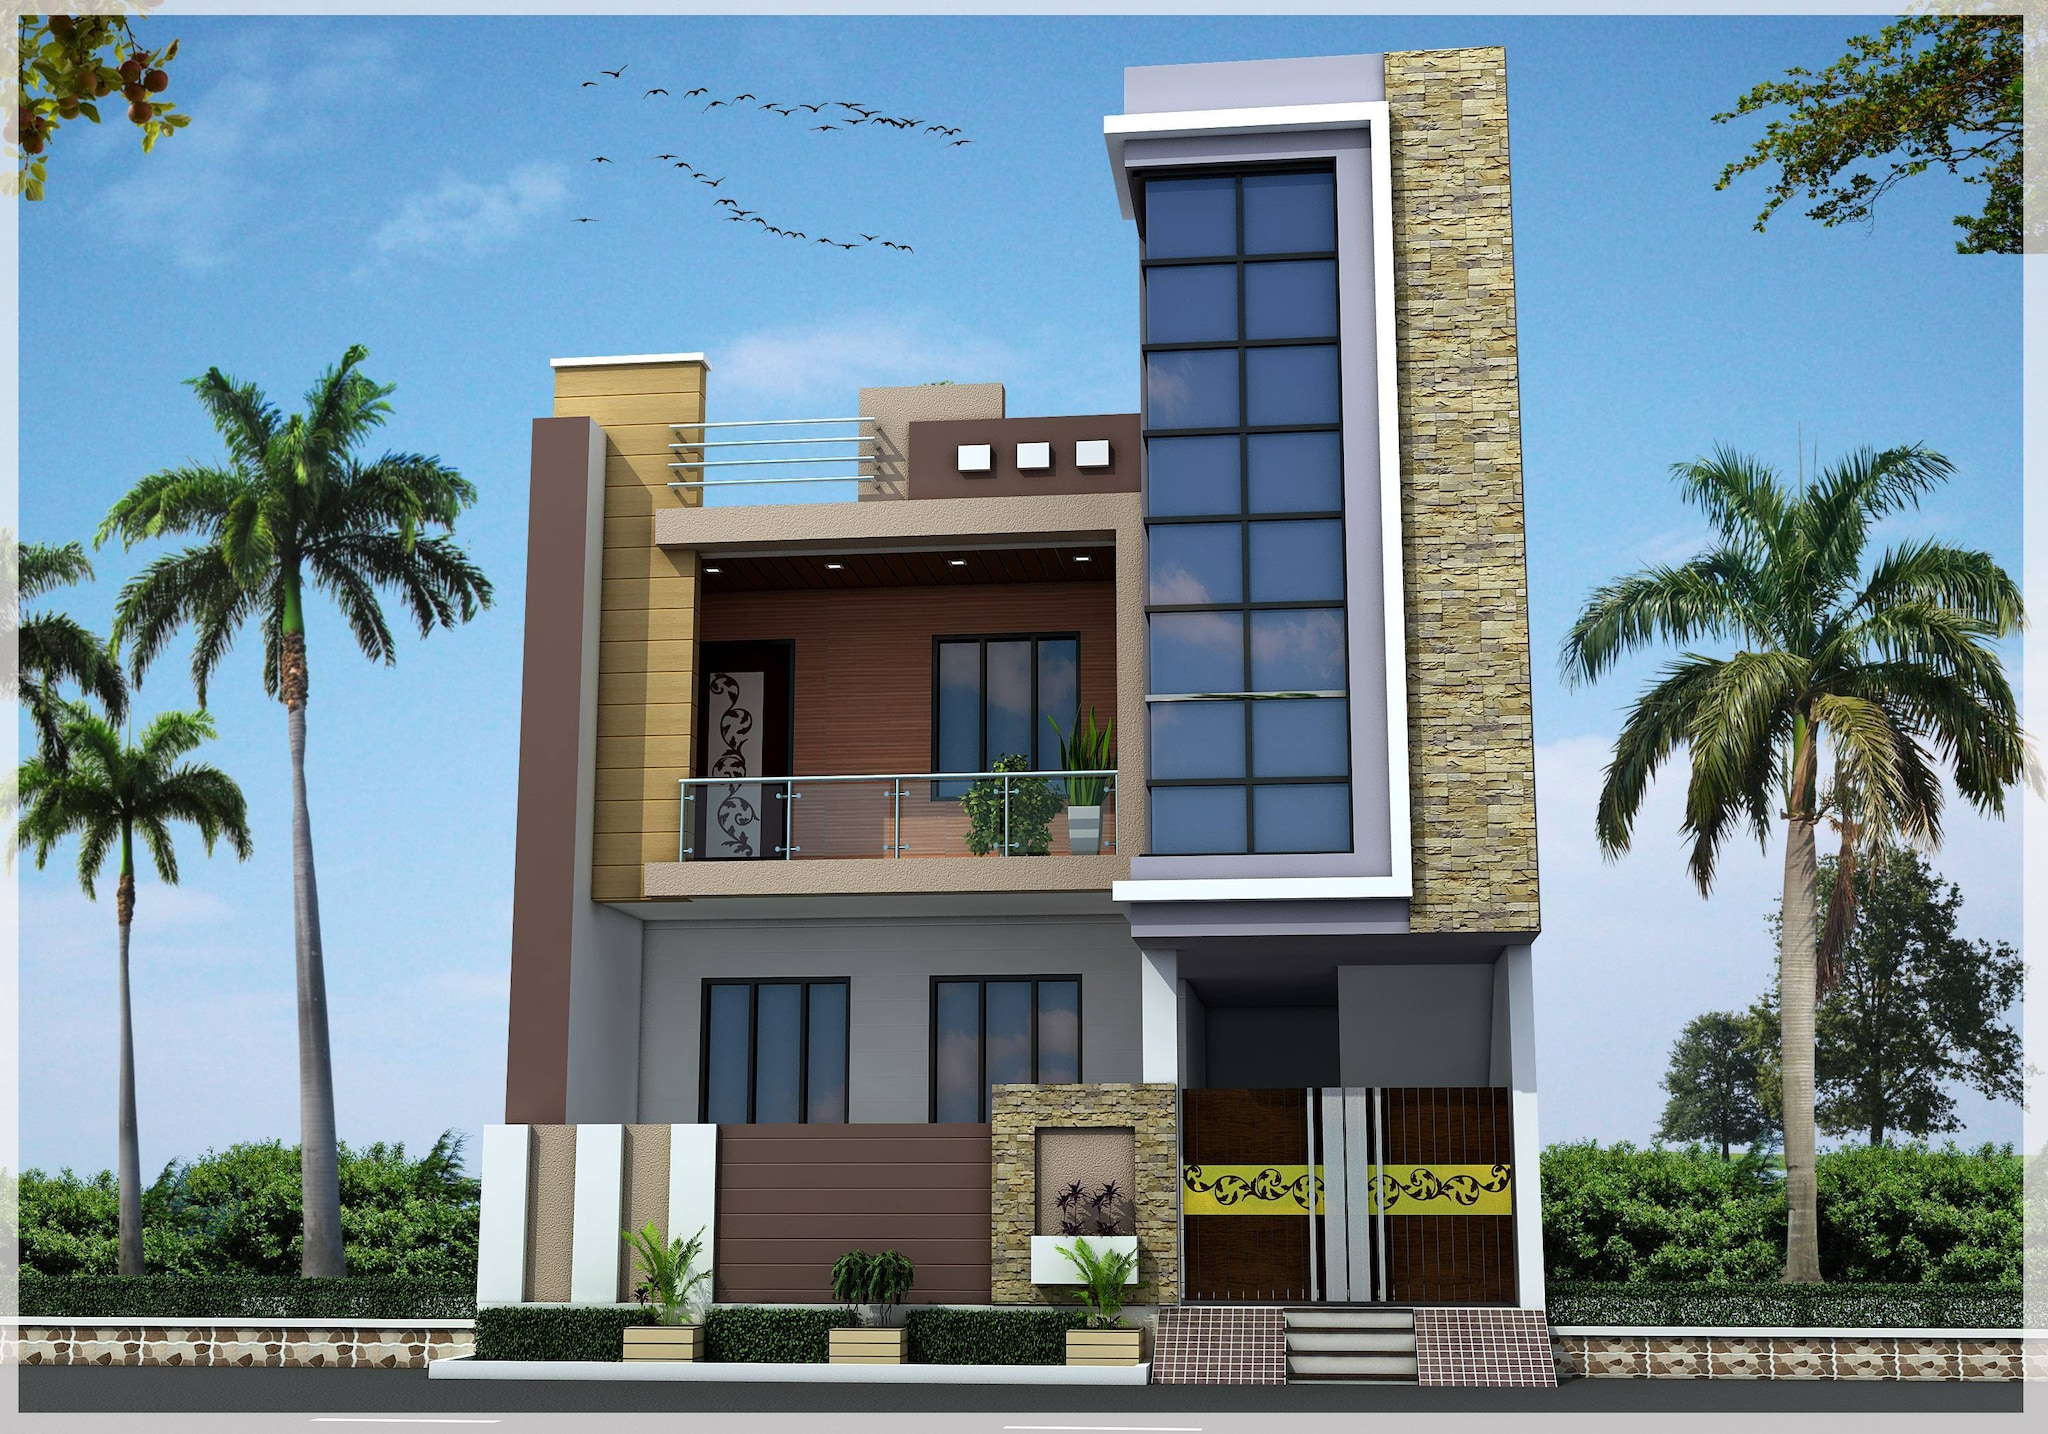 Shri Ram Design Engineer Mahaveer Nagar Architects In